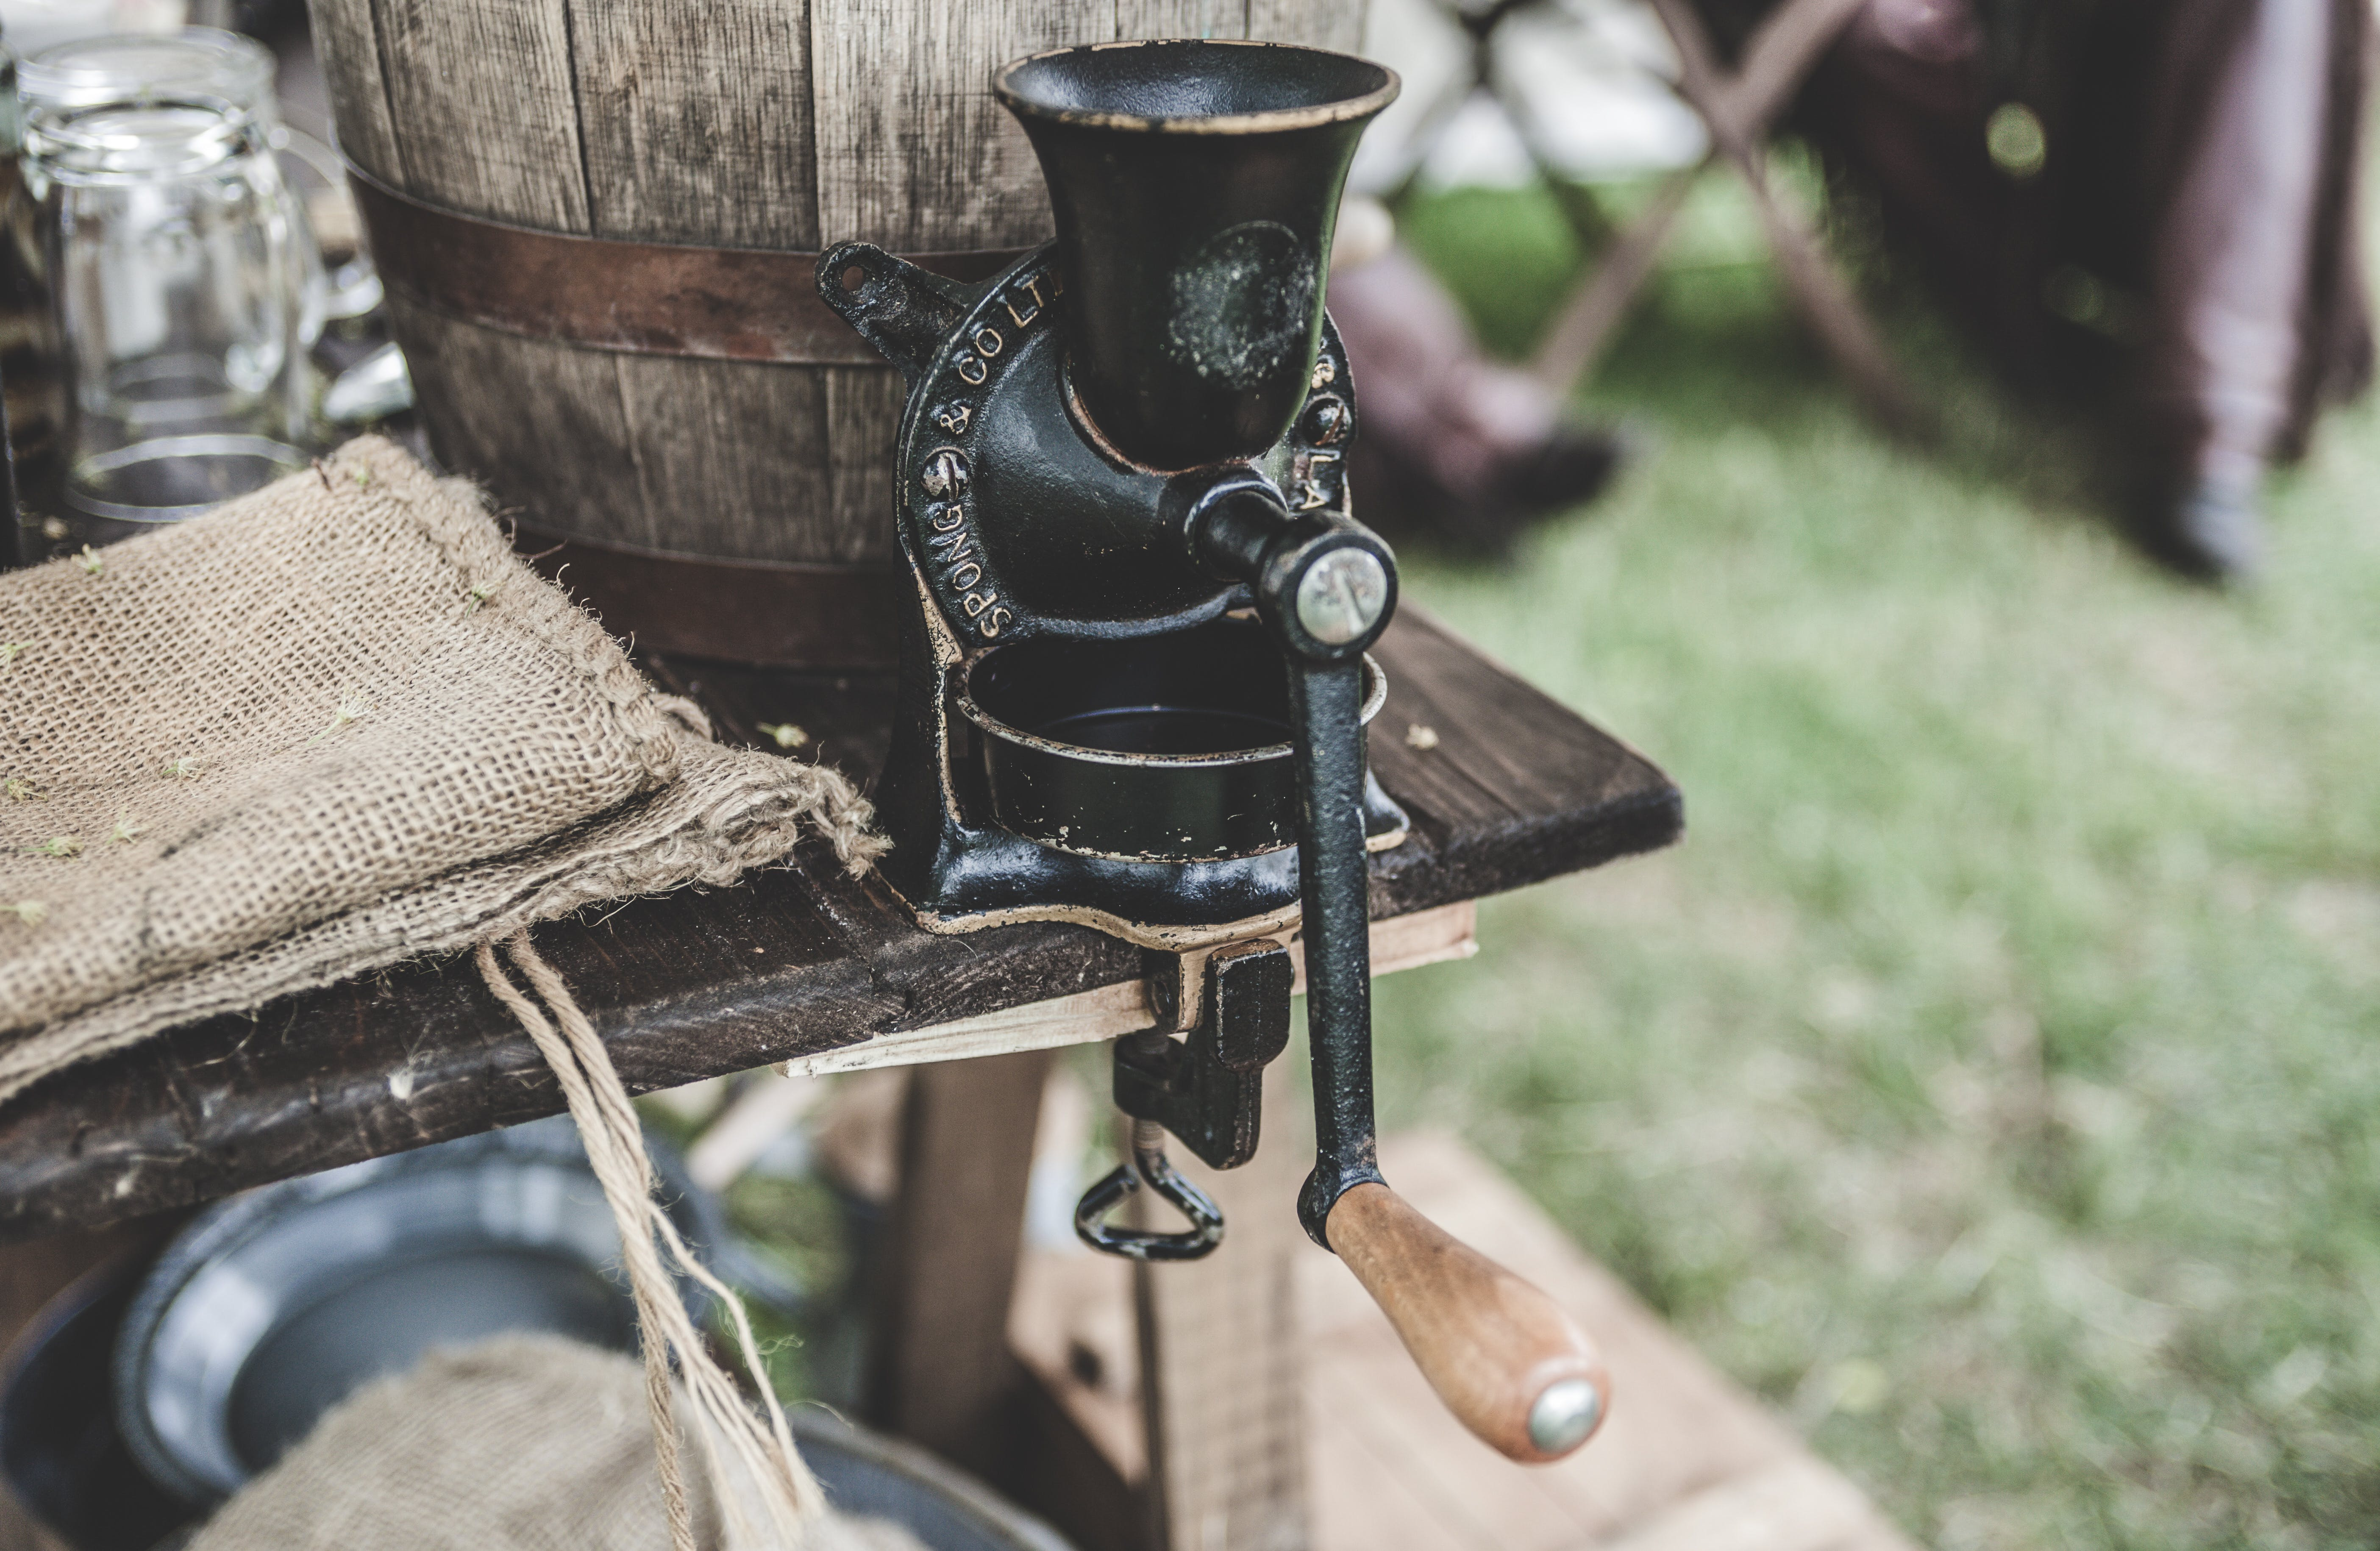 Black Steel Grinder on Brown Wooden Table